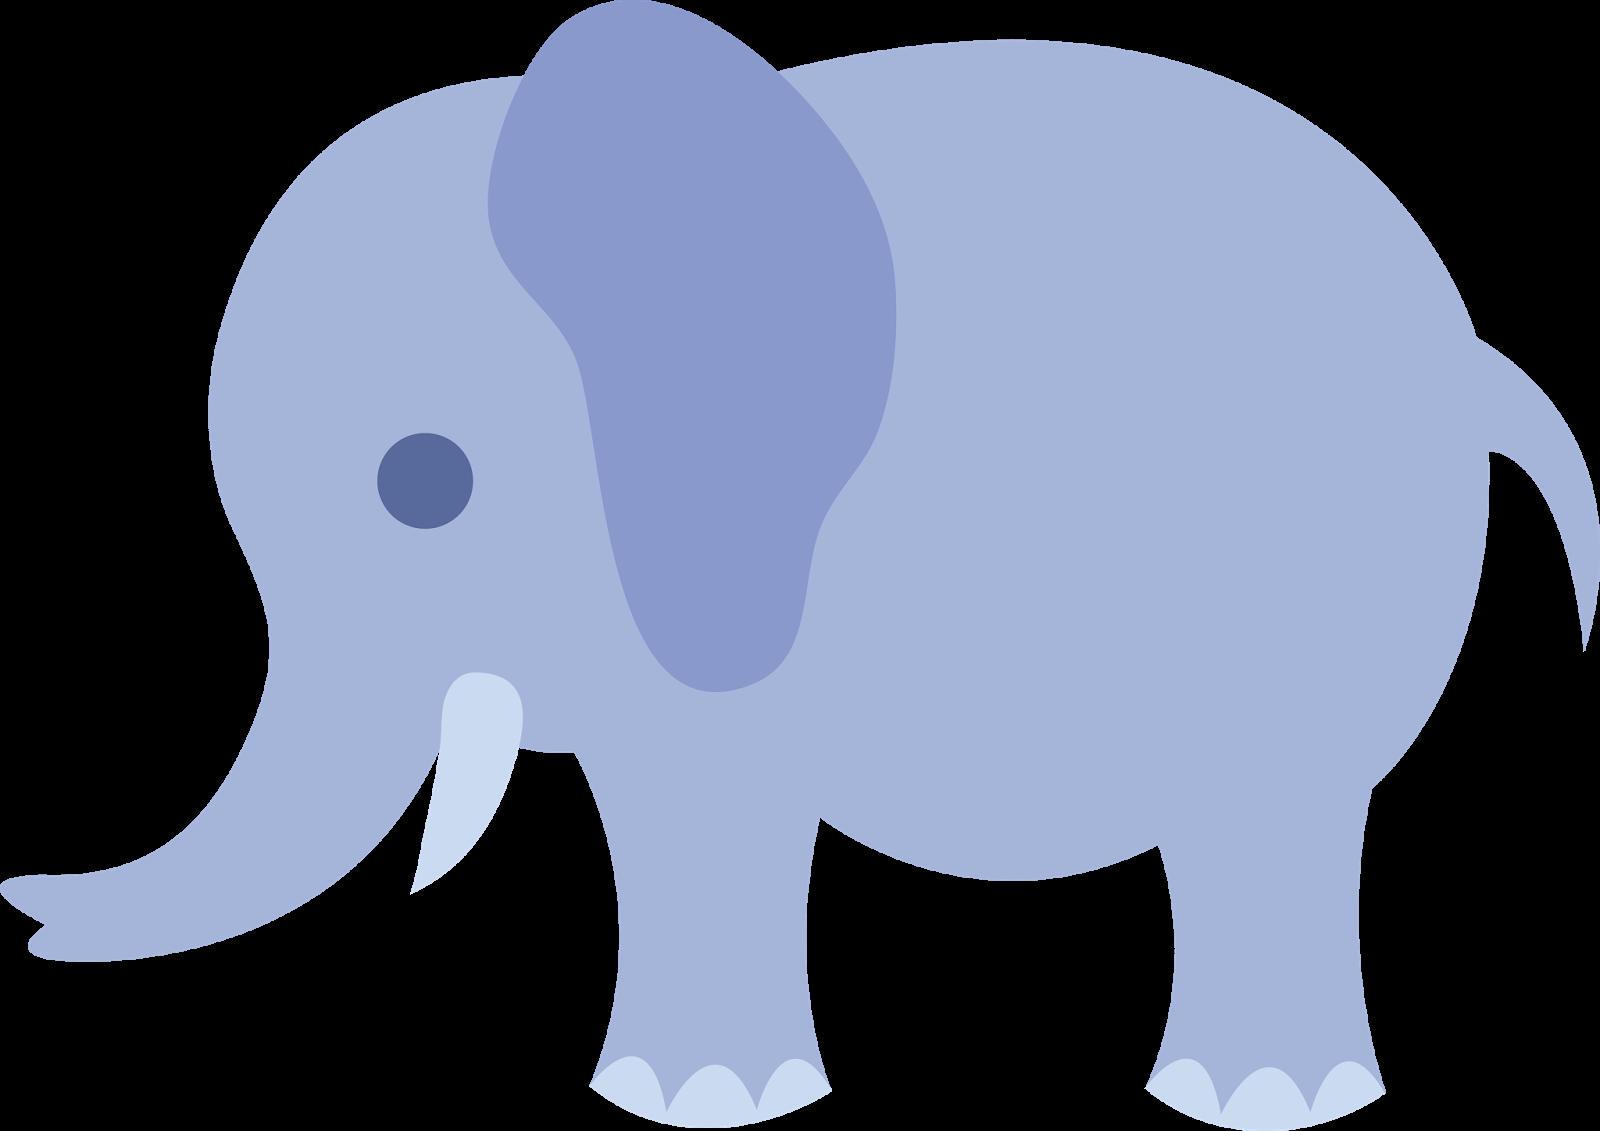 Feet clipart baby boy. Girl elephant free download